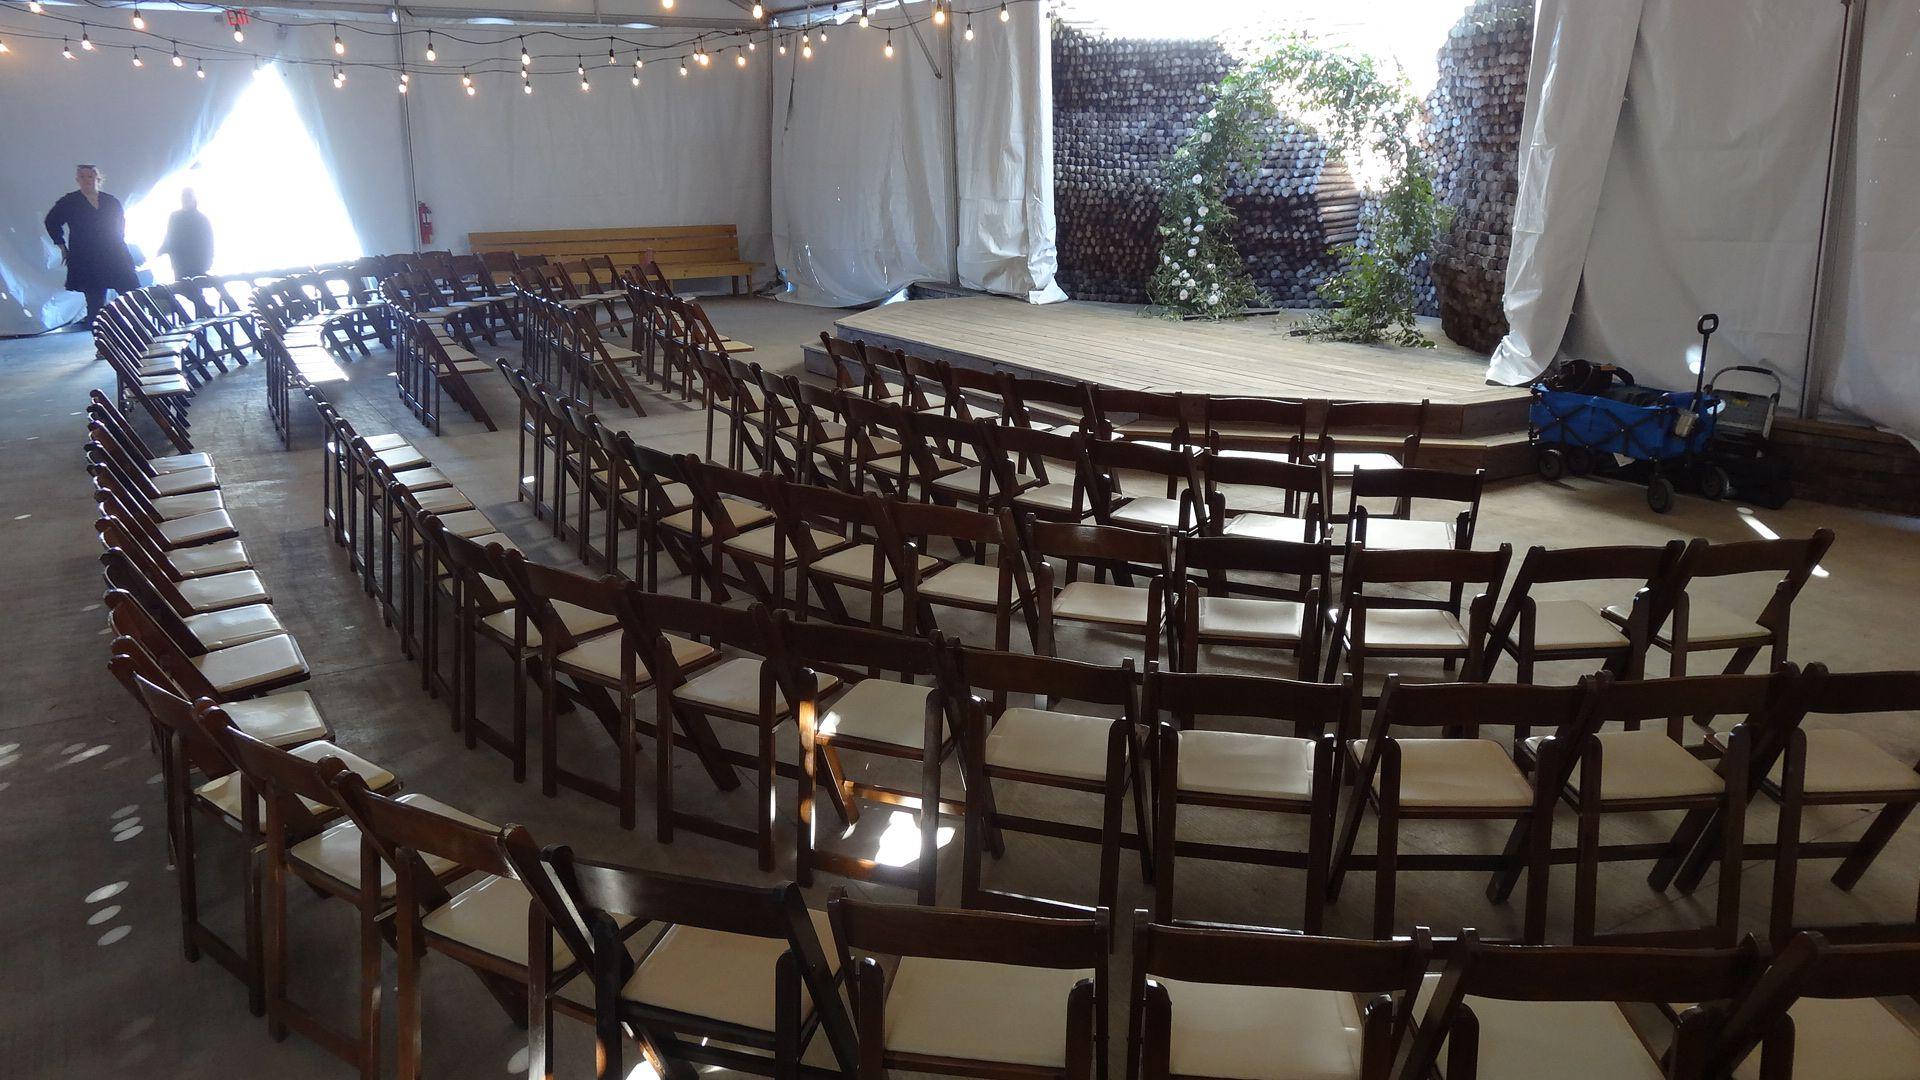 40+ Wedding arch rental memphis tn ideas in 2021